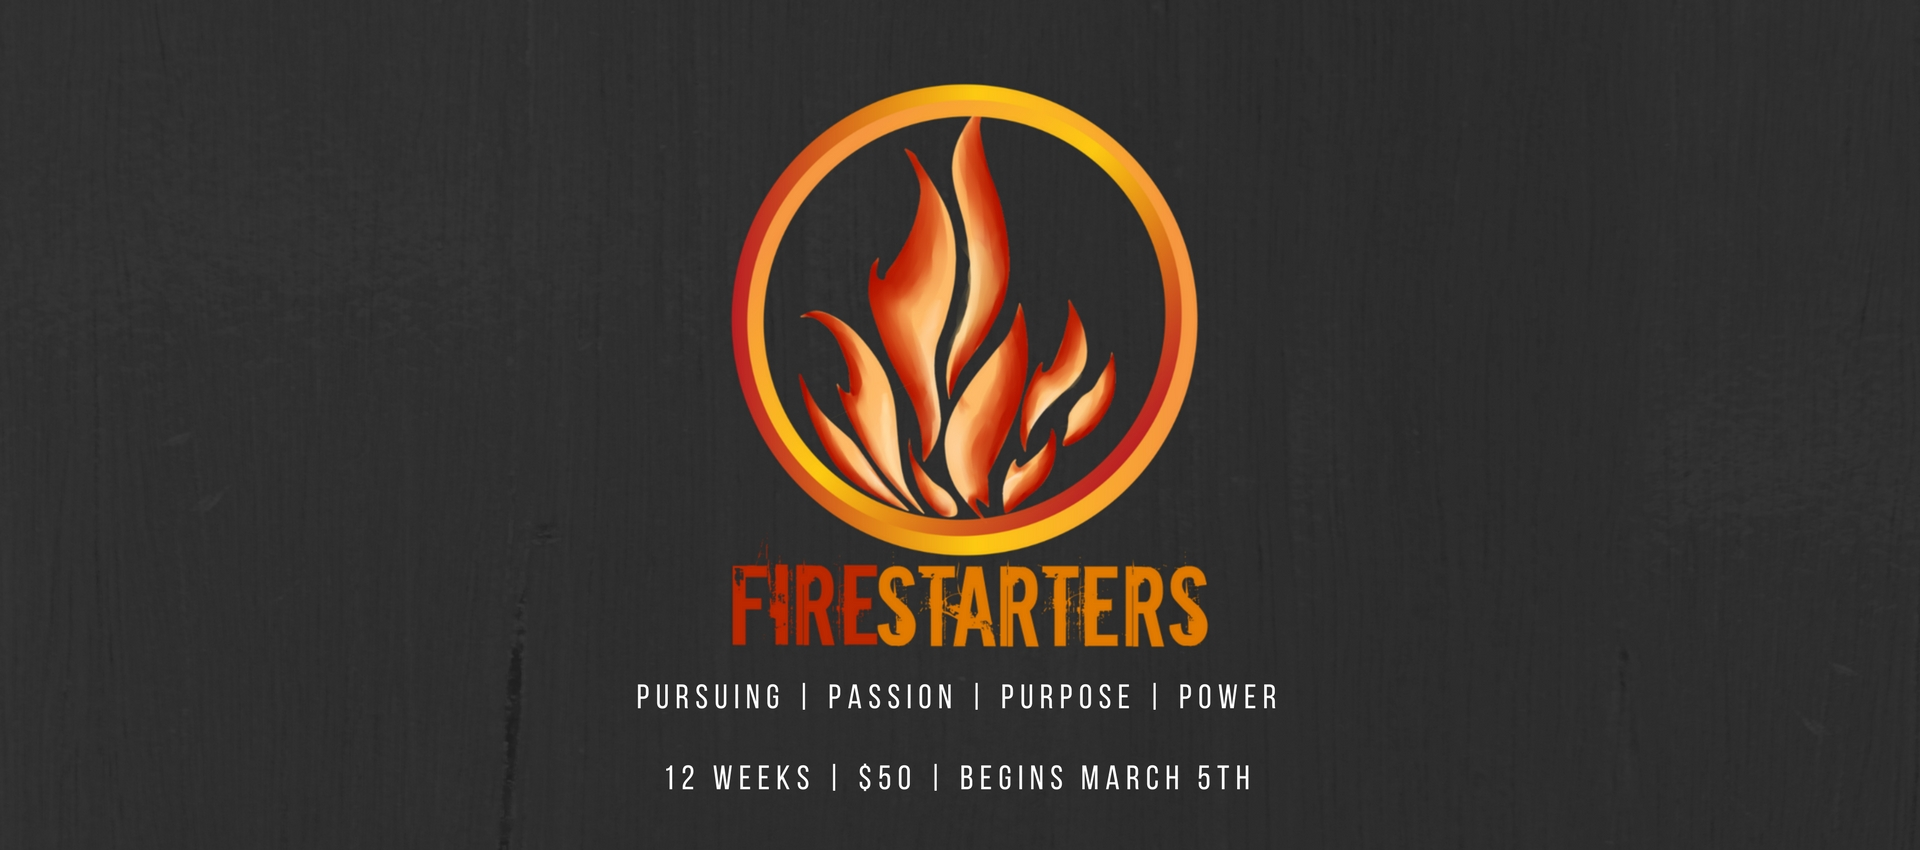 Firestarters class - Starts March 5th